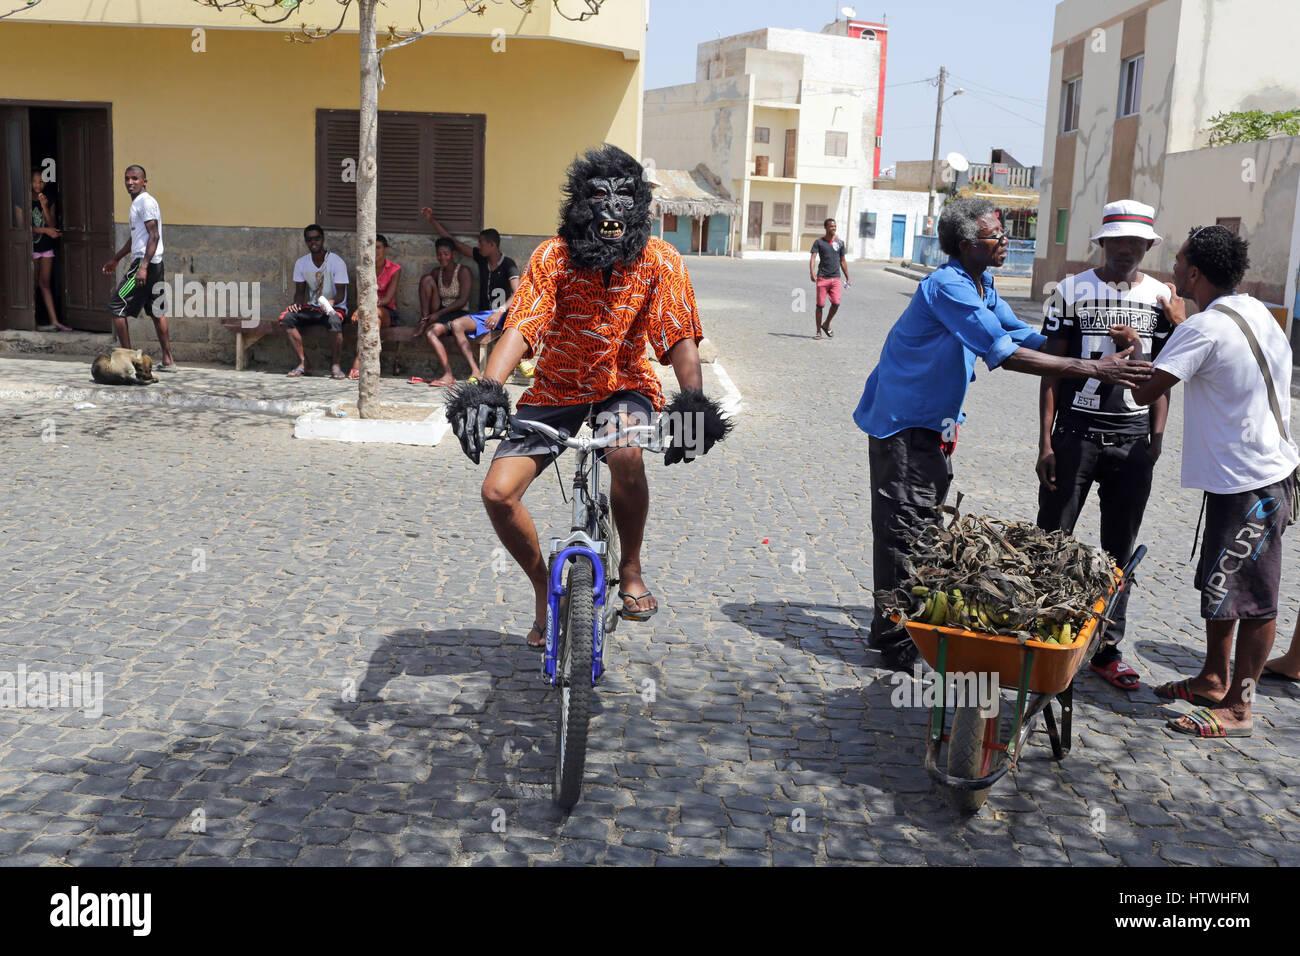 Man dressed as a Gorilla riding a bike - Stock Image